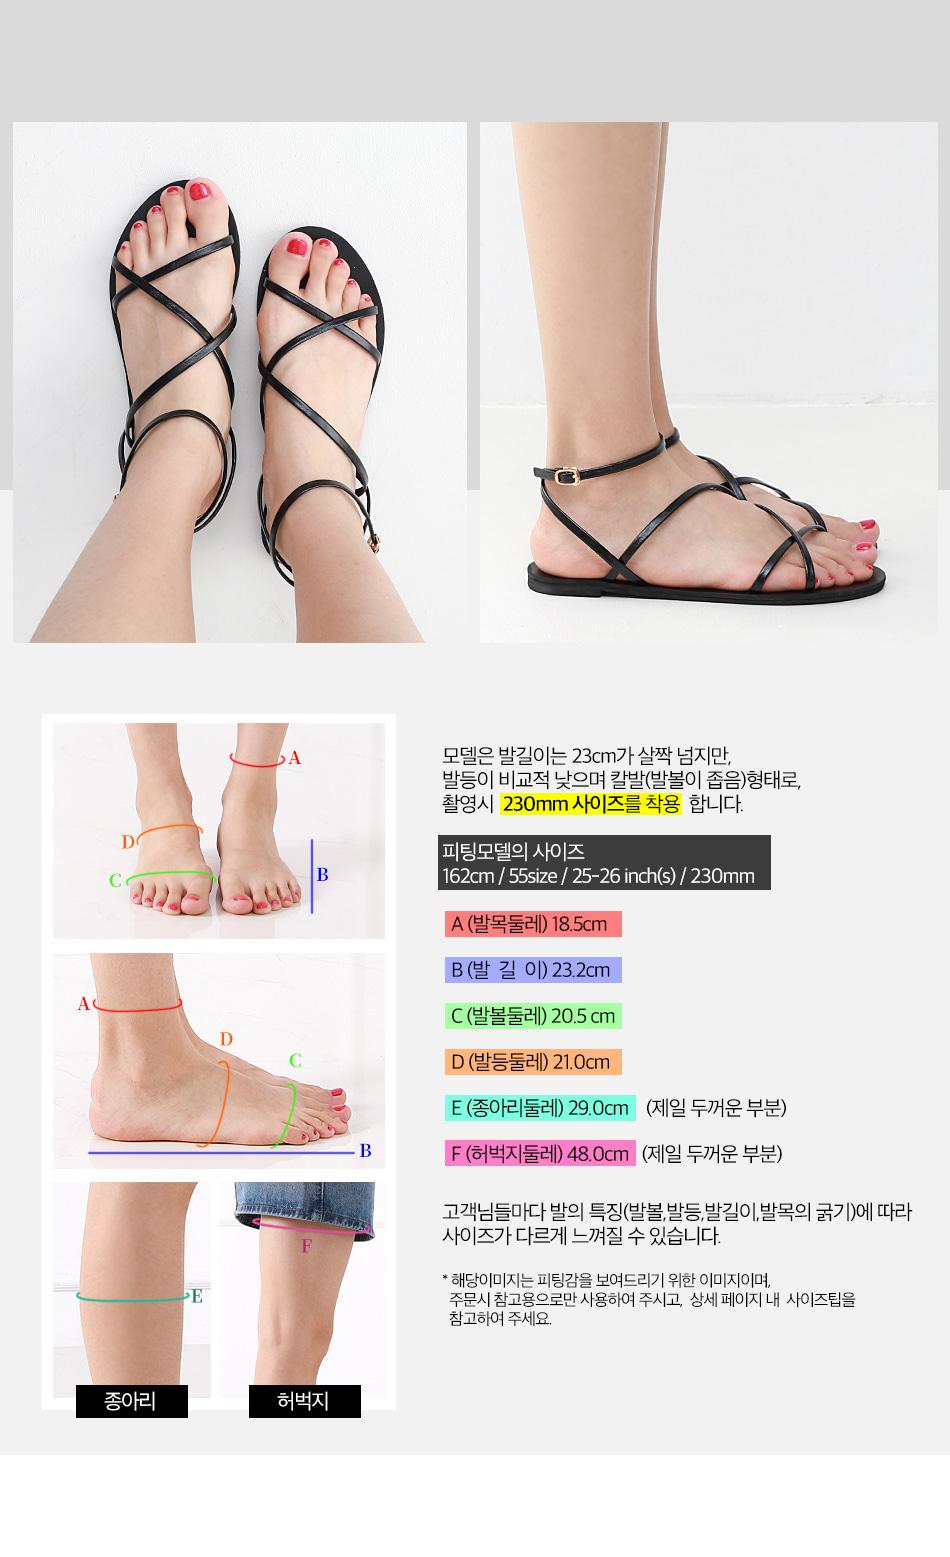 Isshu Slim Glady Ankle Strap Flat Sandal 10750 ♡ 2nd Edition ♡